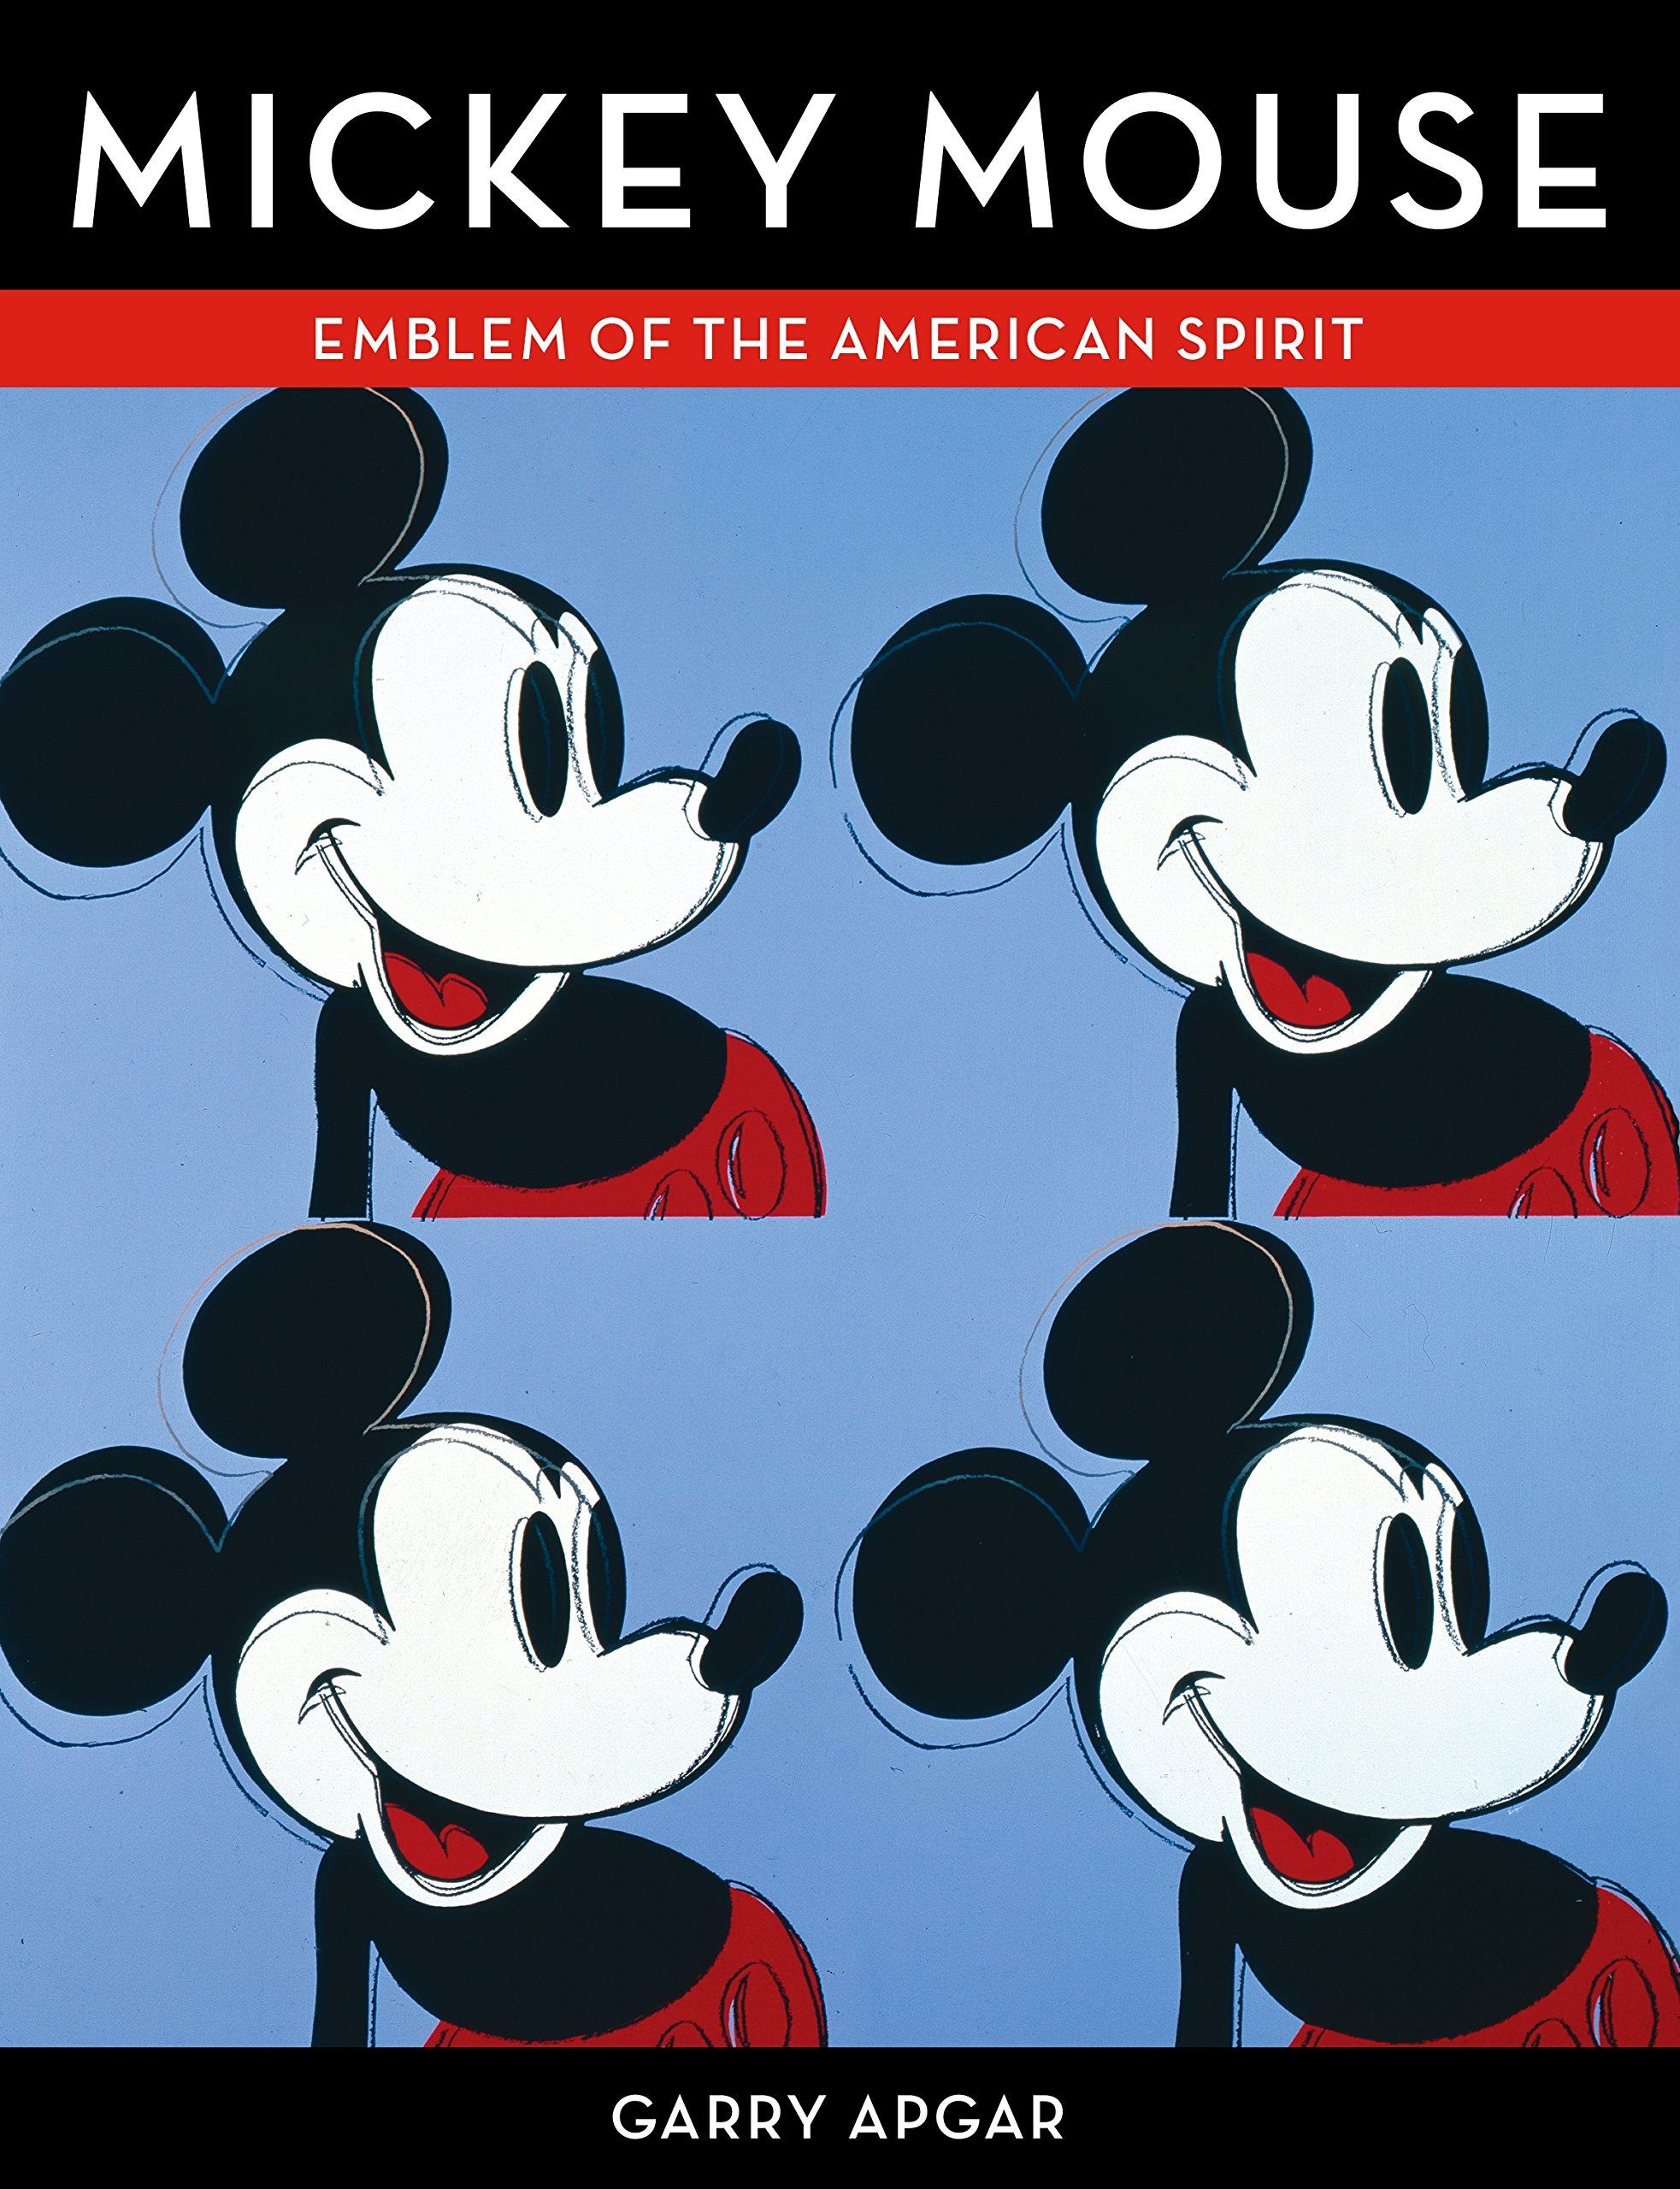 Mickey Mouse Emblem Of The American Spirit Garry Apgar